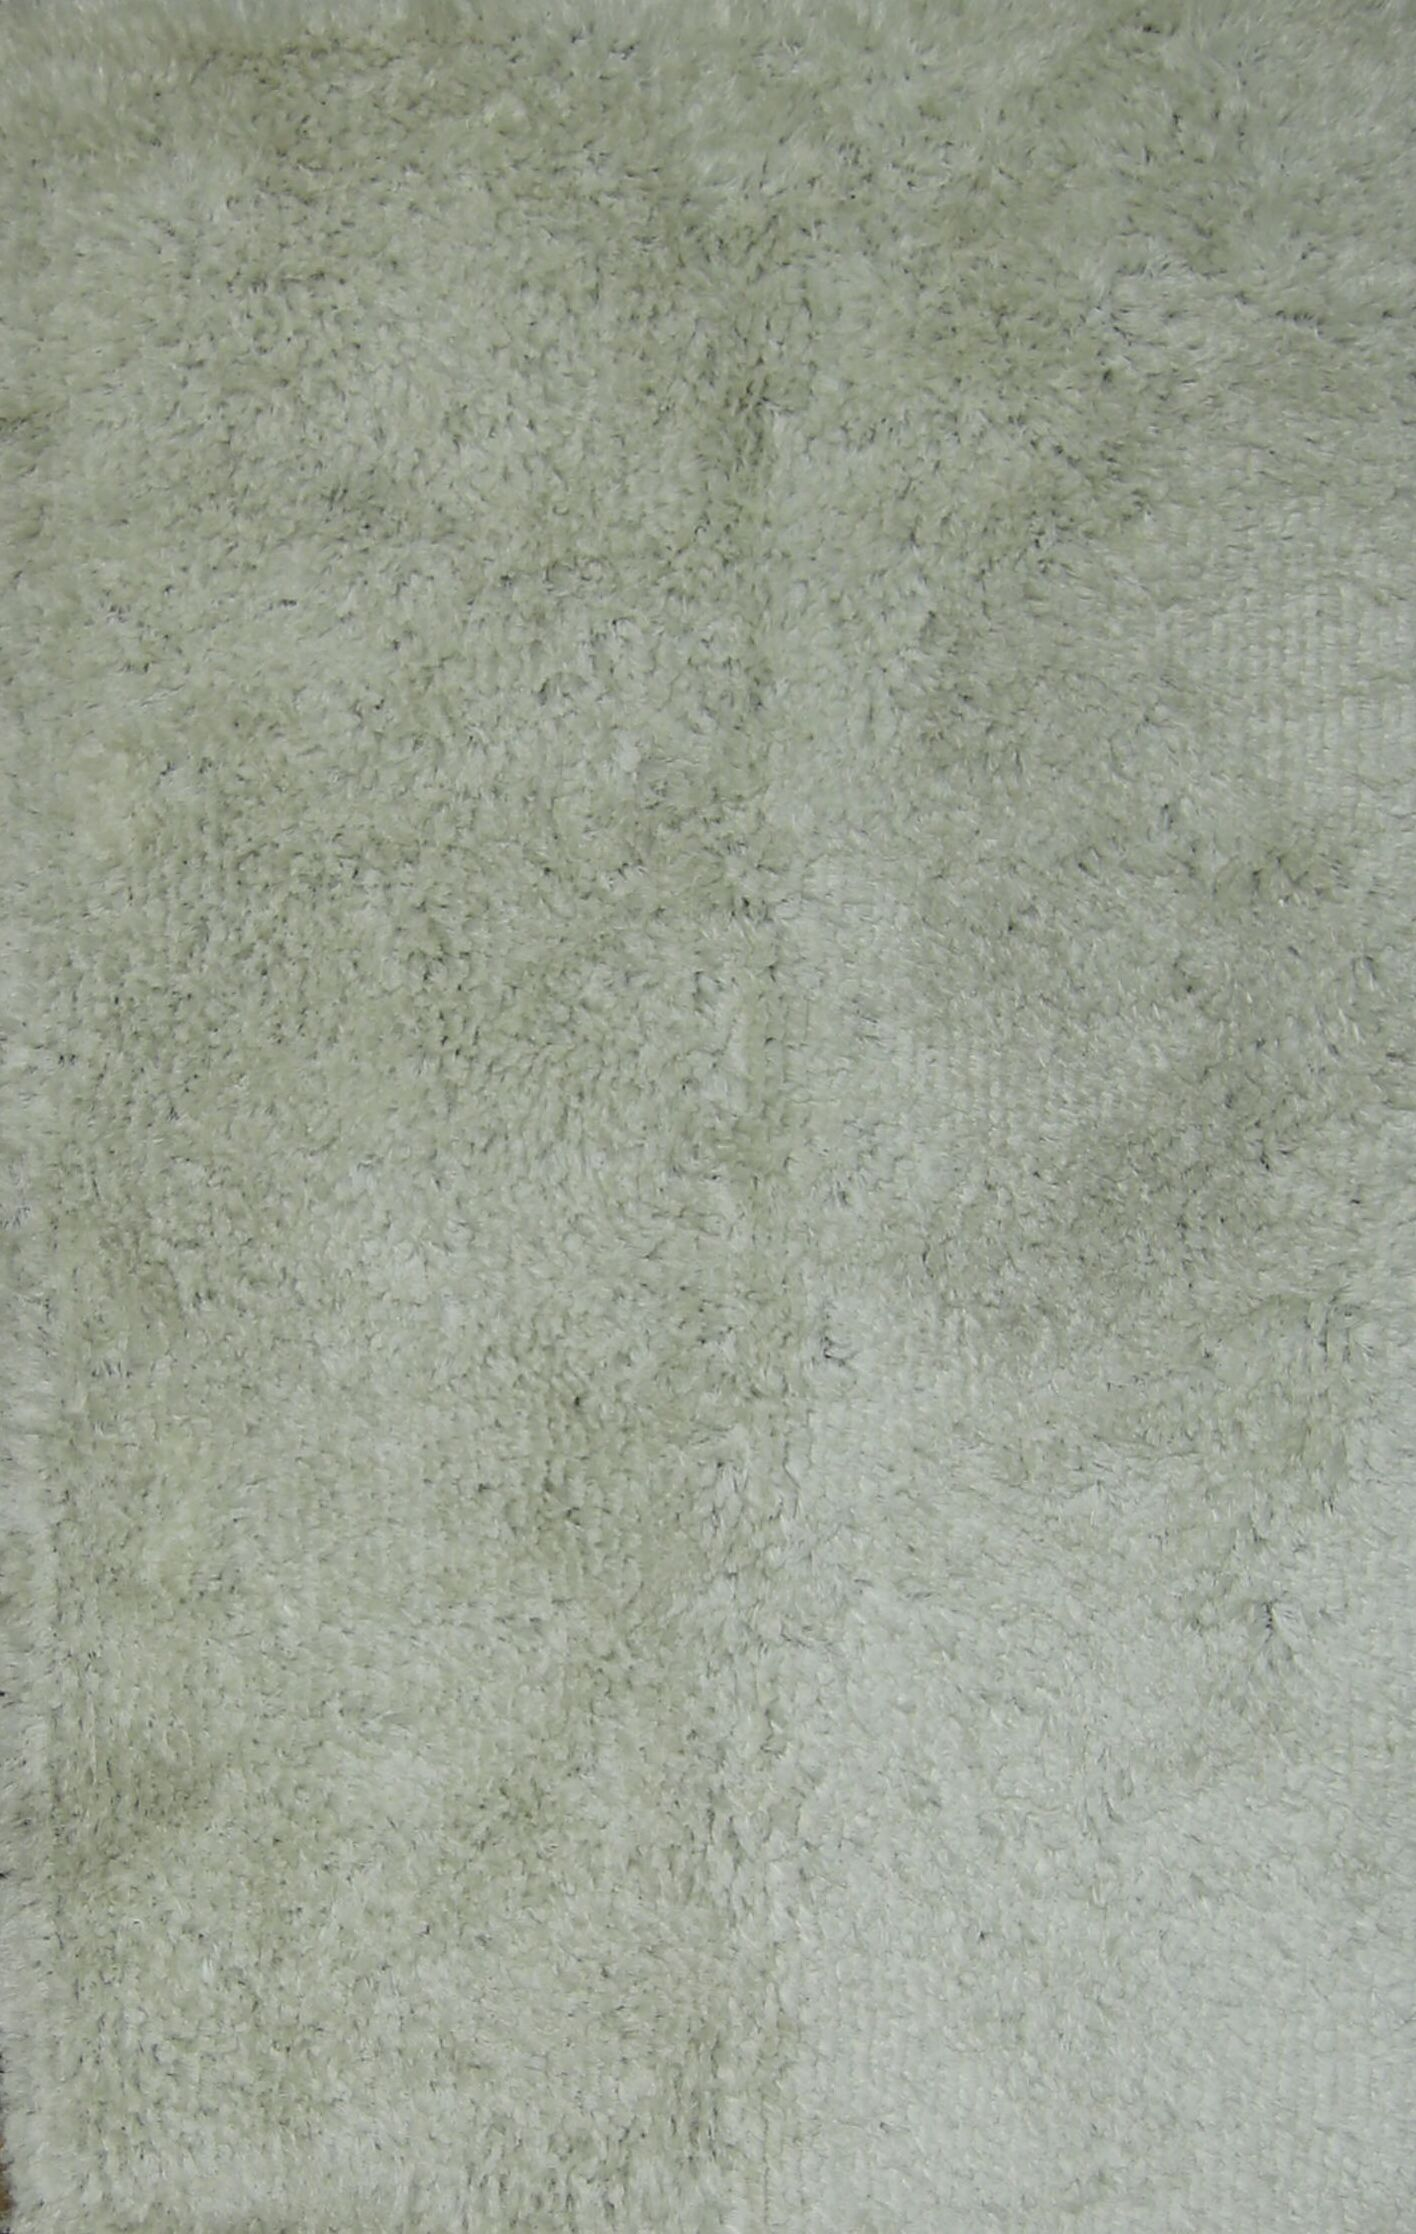 Yazmin Shaggy Oriental Hand-Tufted White Area Rug